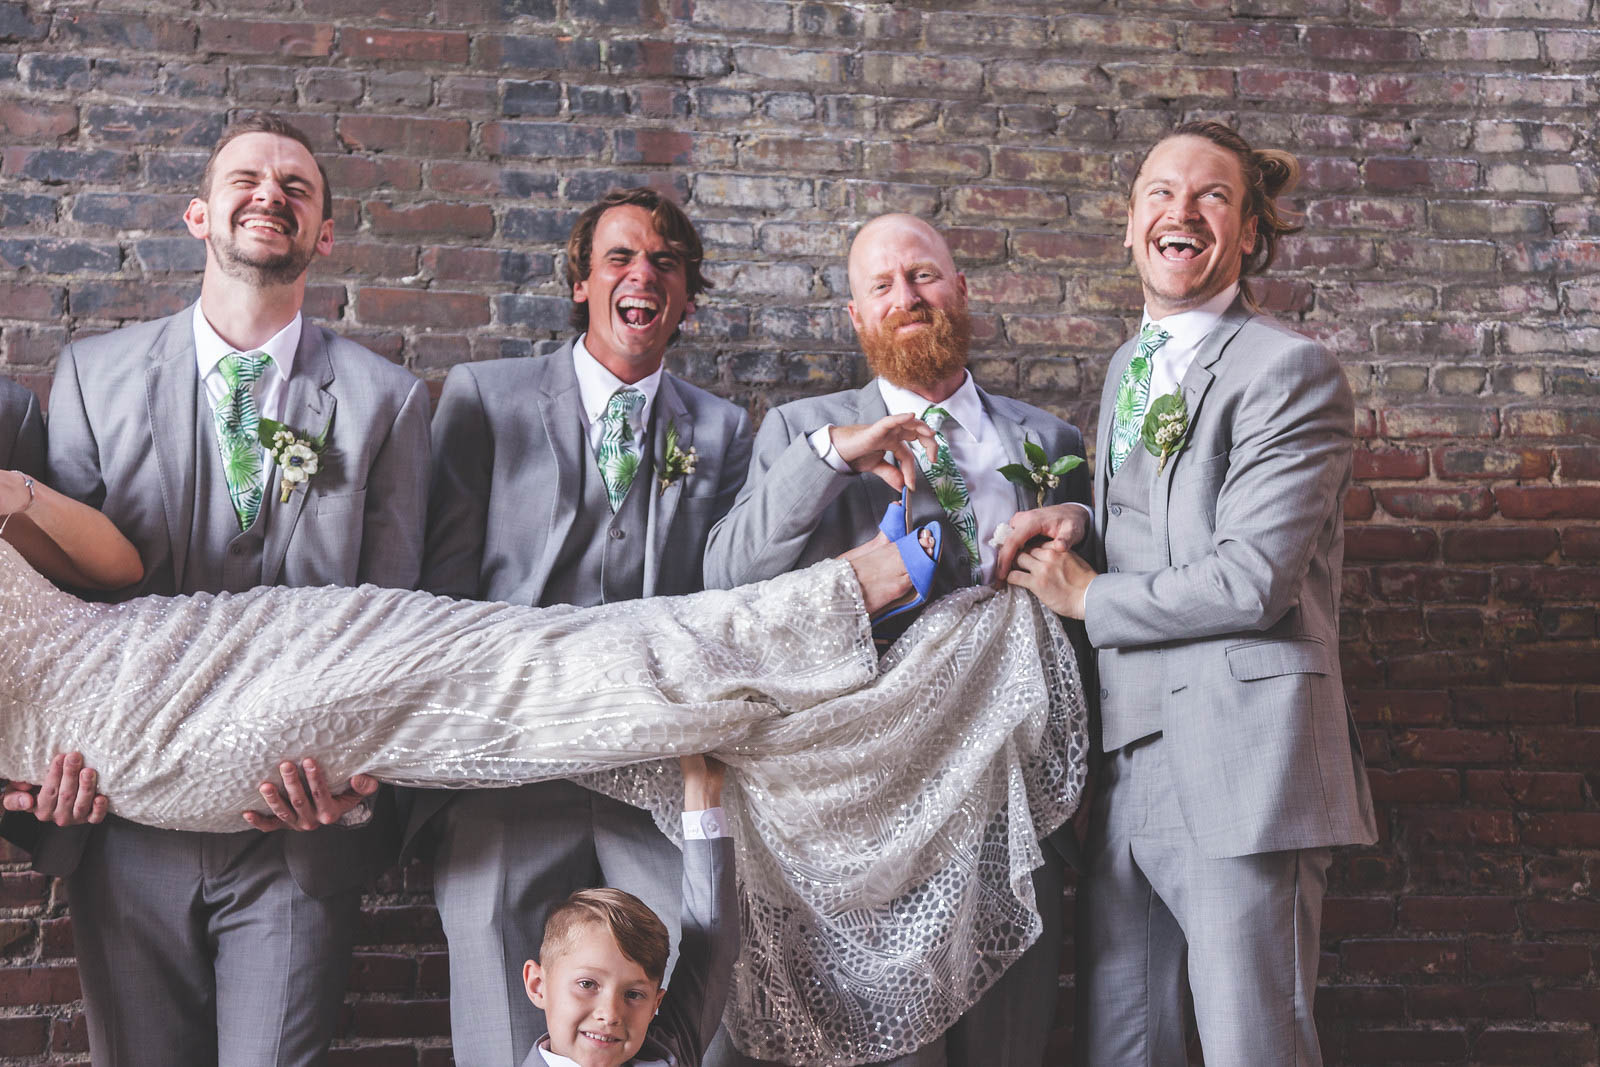 The-Glass-Factory-Wedding-Photographer-Adam-Szarmack-49.jpg